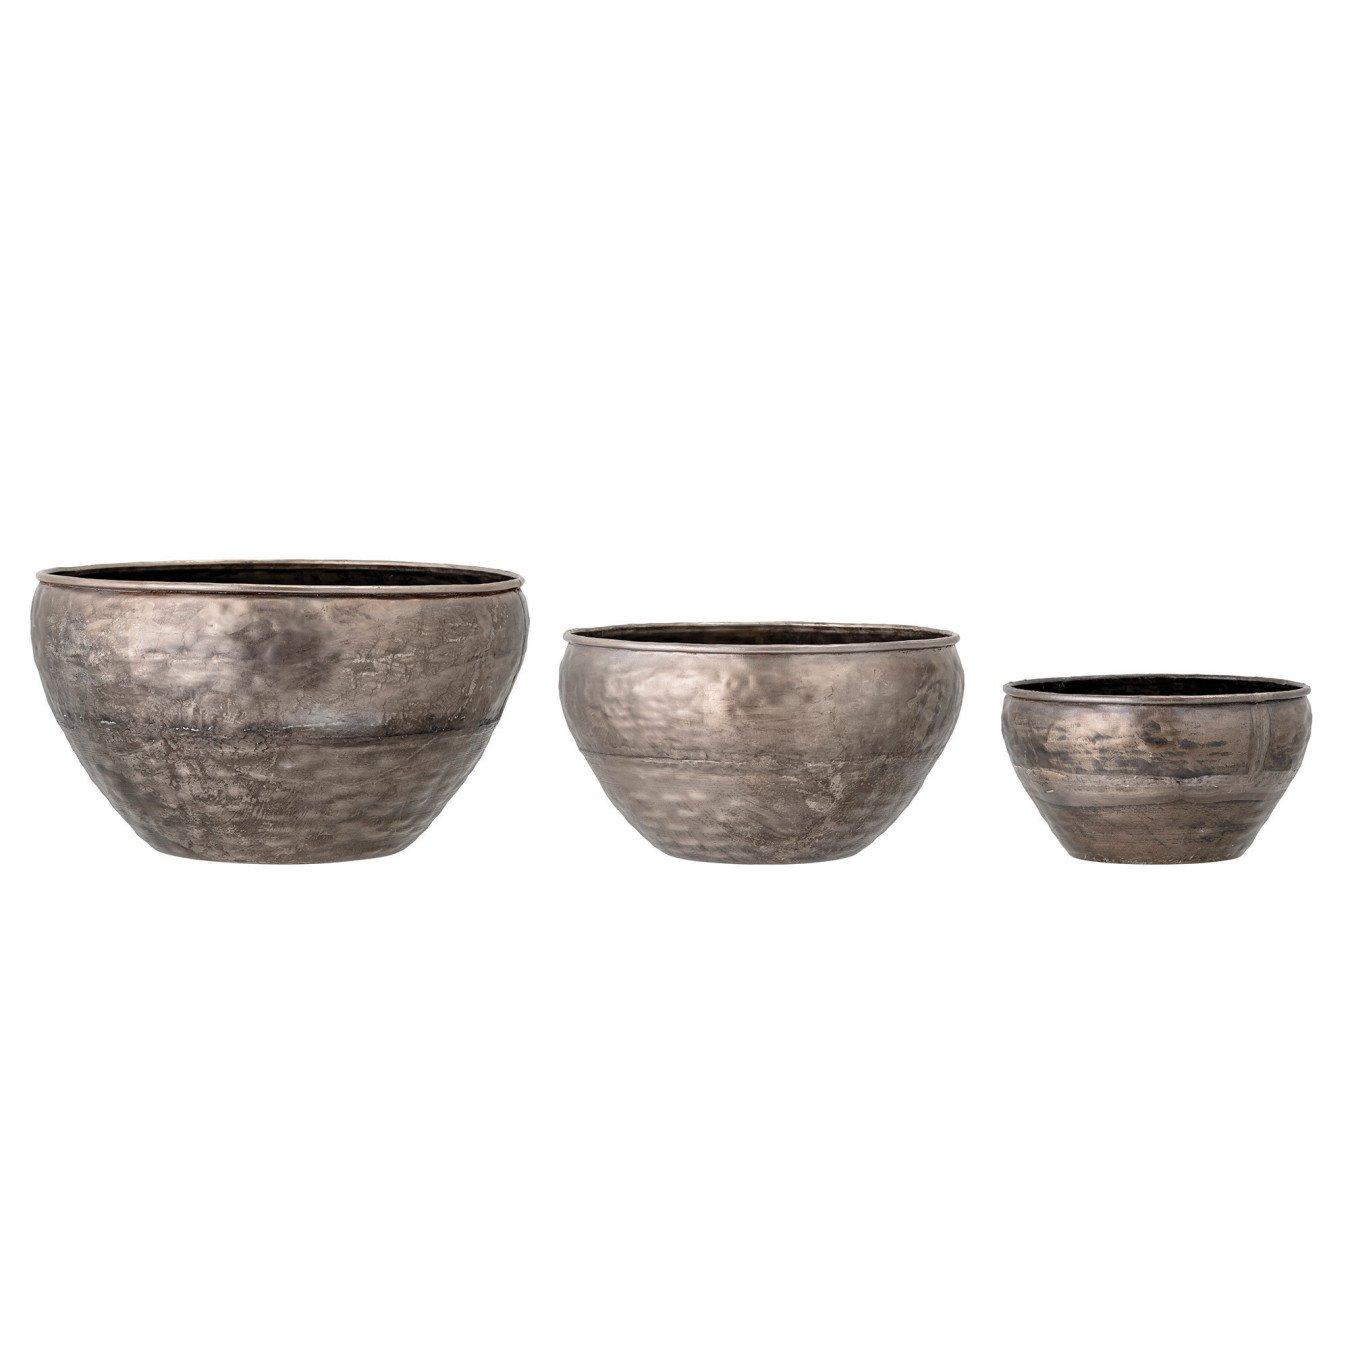 Galvanized Metal Planters, Set of 3